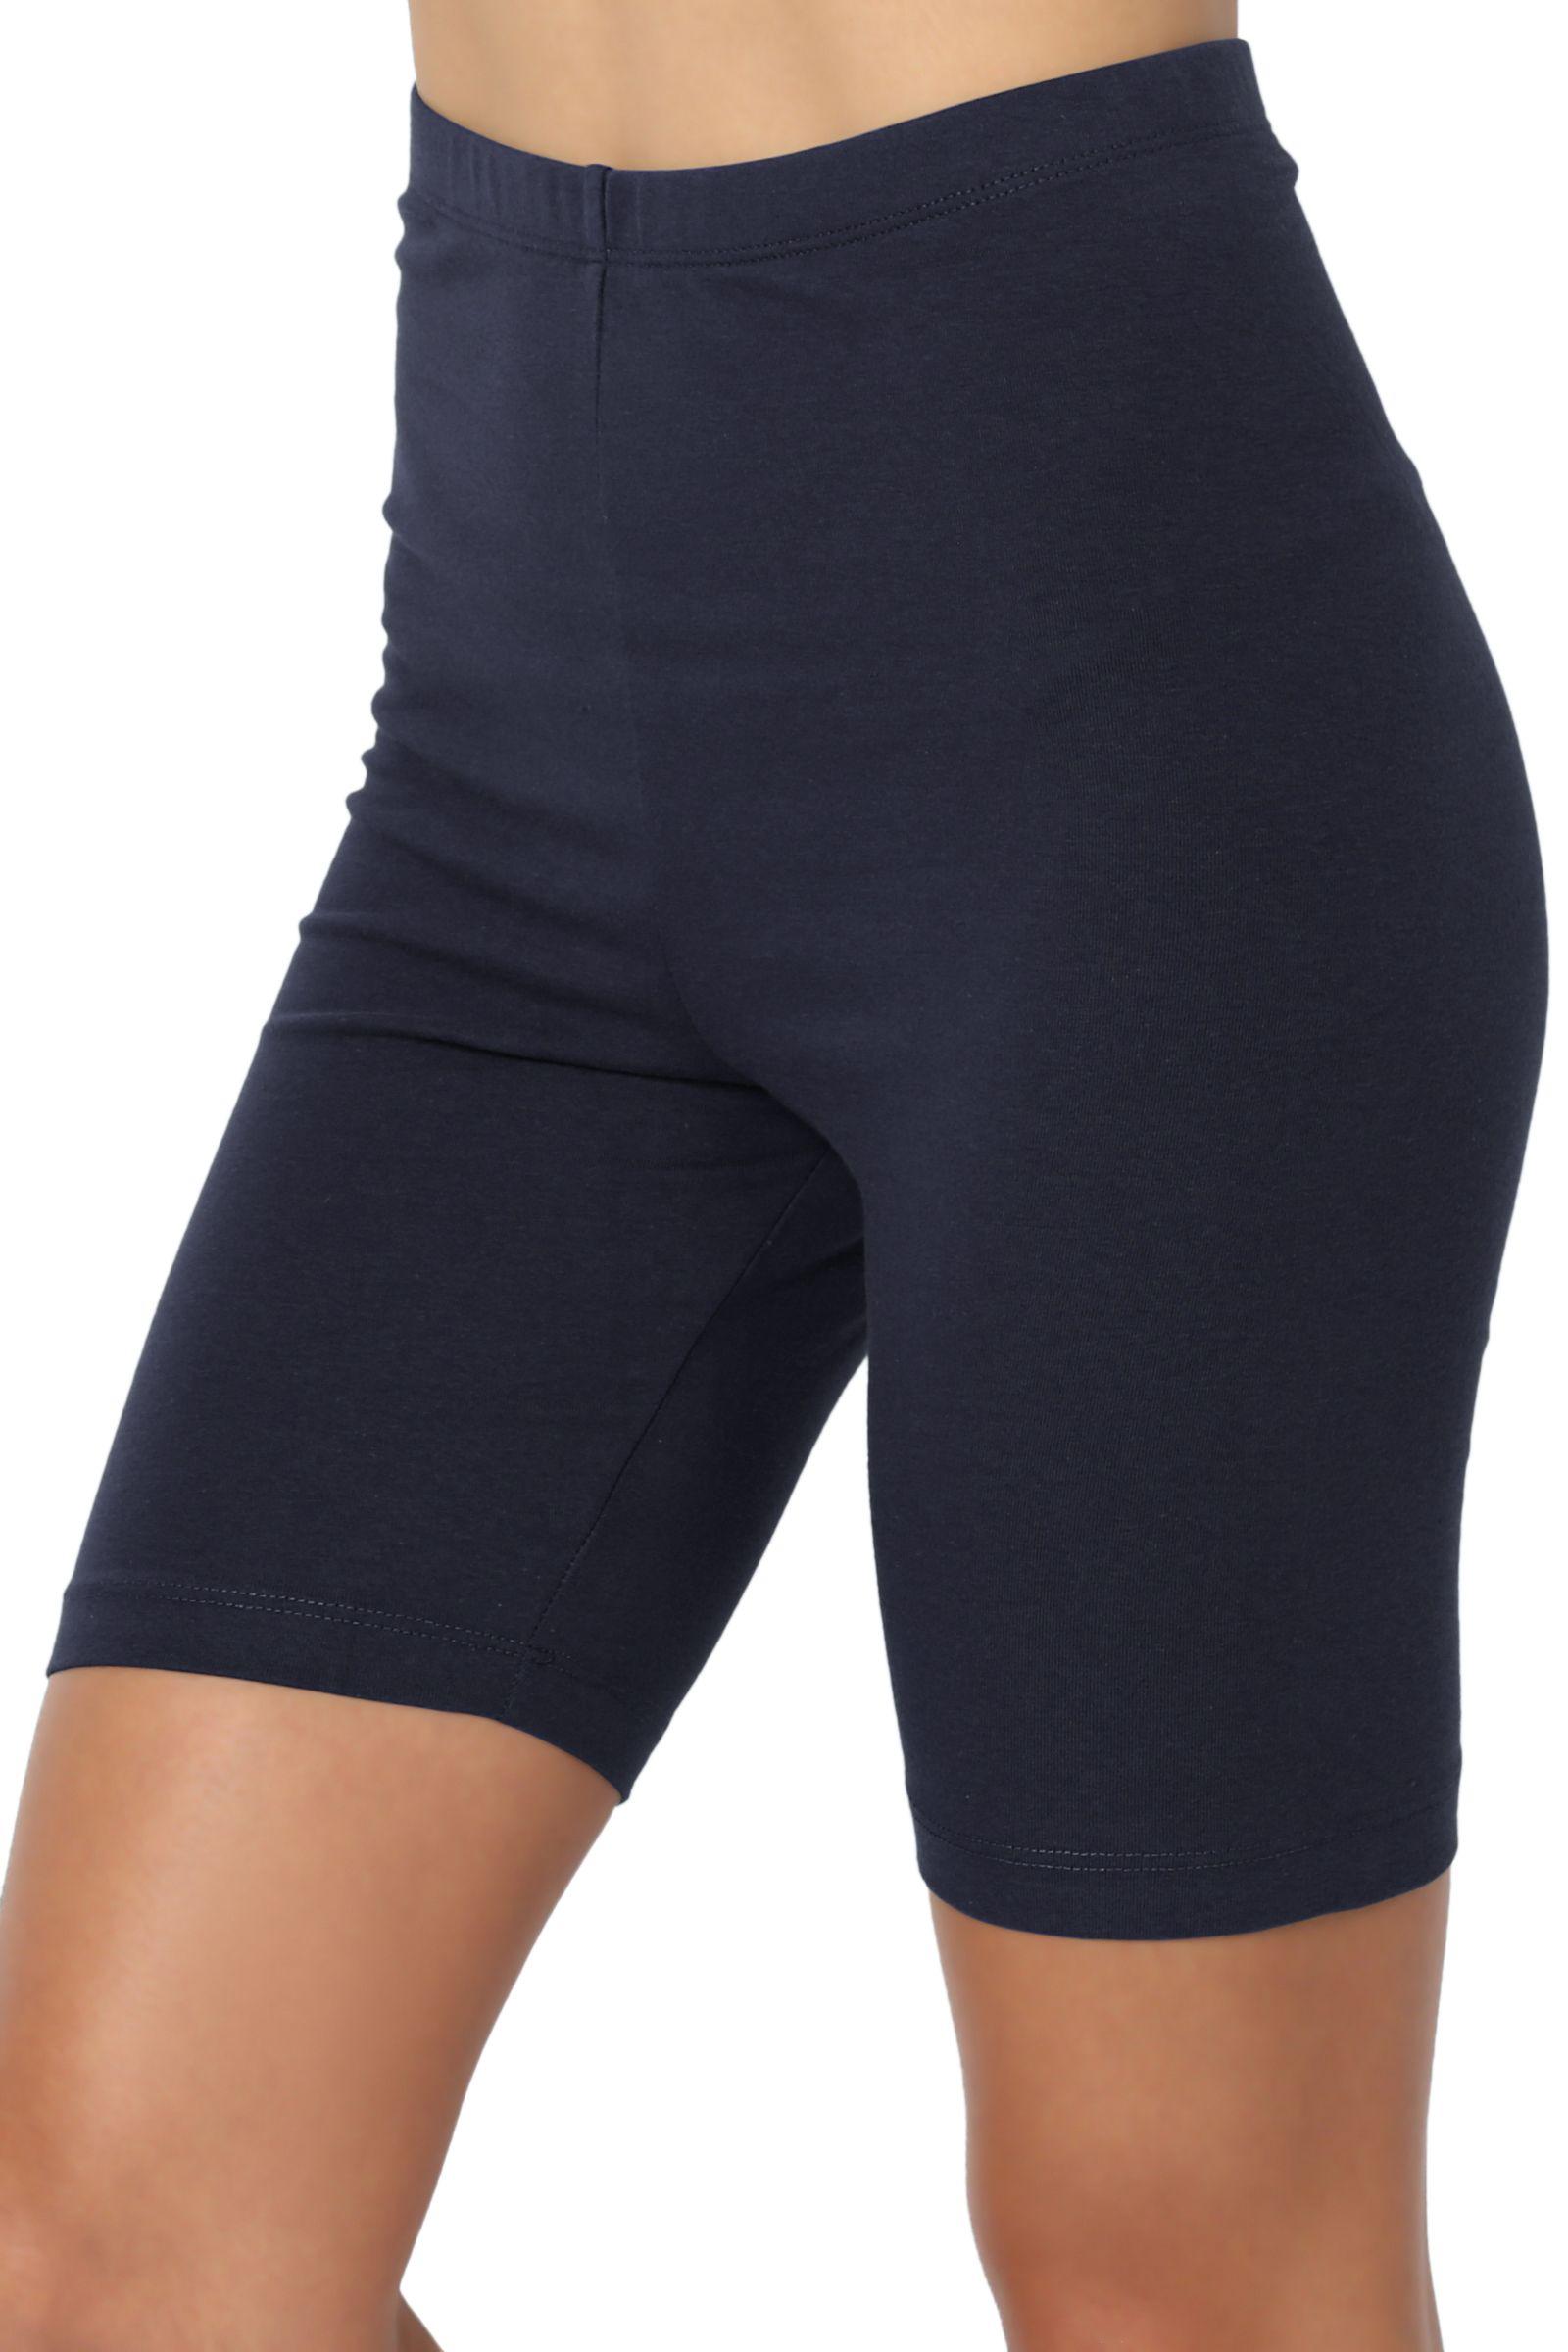 1d9ef40b Buy TheMogan Women's S~3X Mid Thigh Stretch Cotton Active Bermuda Under  Short Leggings at Walmart.com